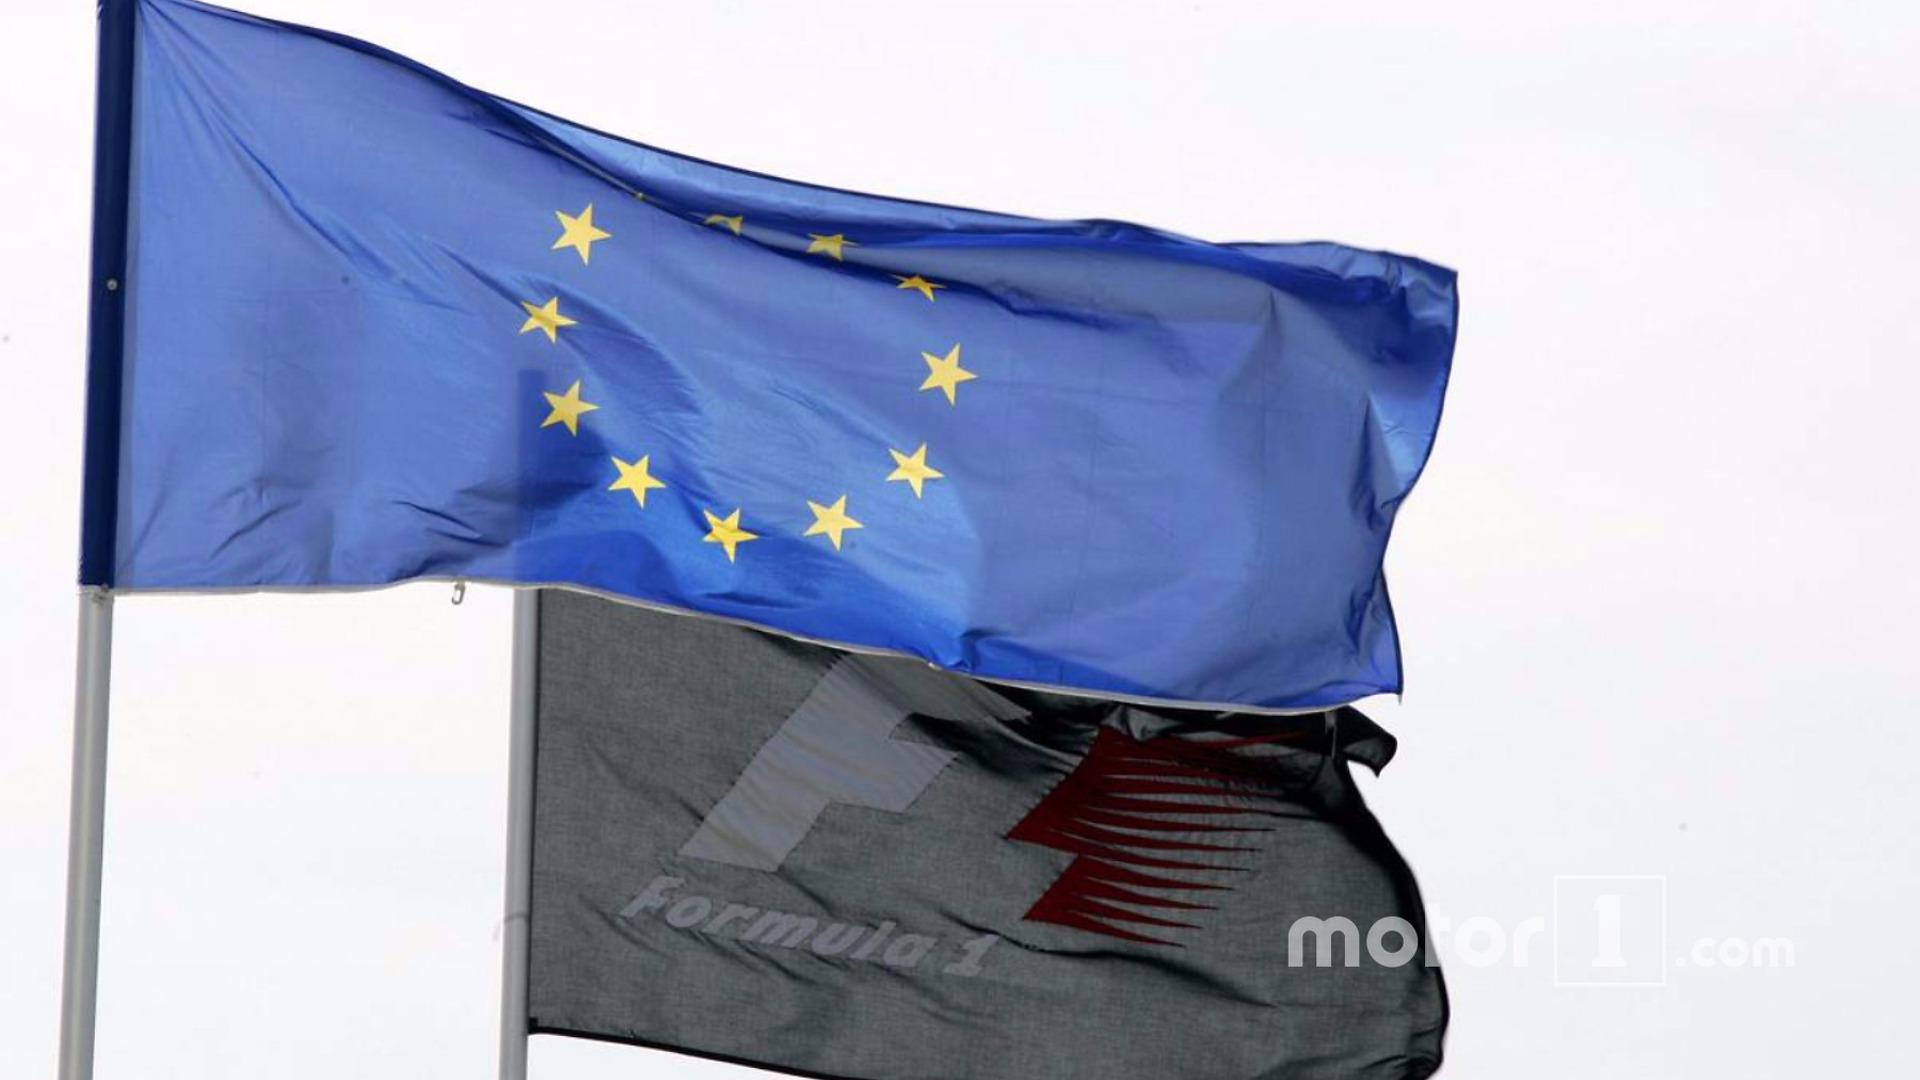 British MEP draws EU's attention to Liberty's F1 purchase